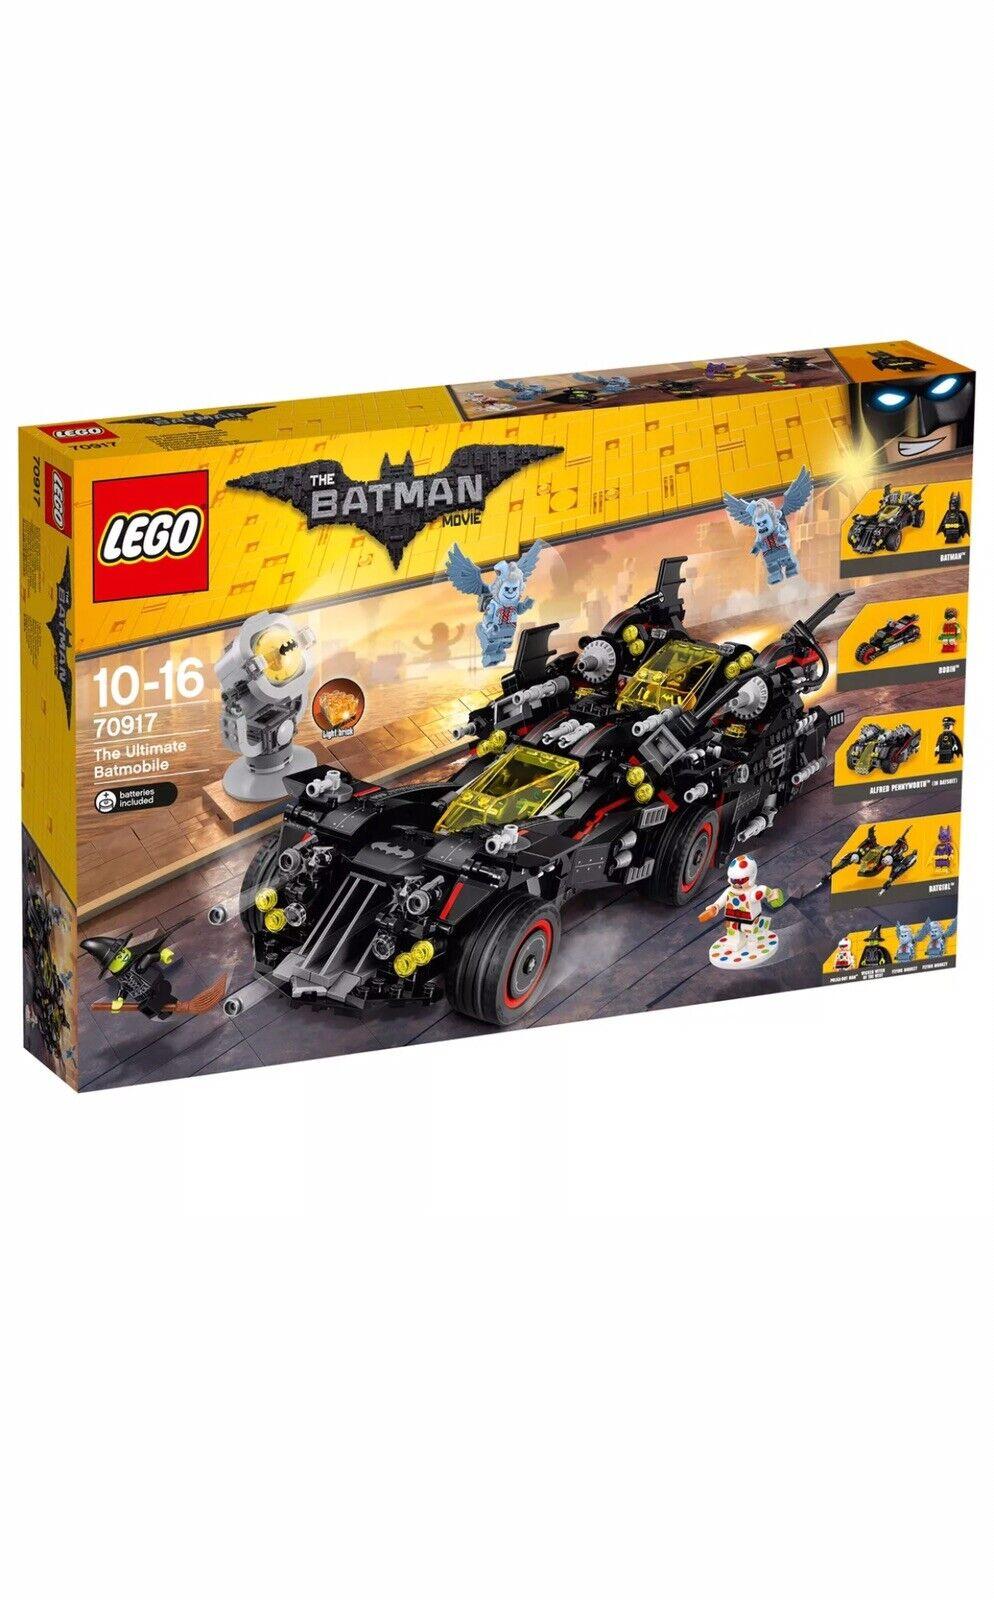 LEGO 70917 Batman Movie The Ultimate Batmobile BNIB